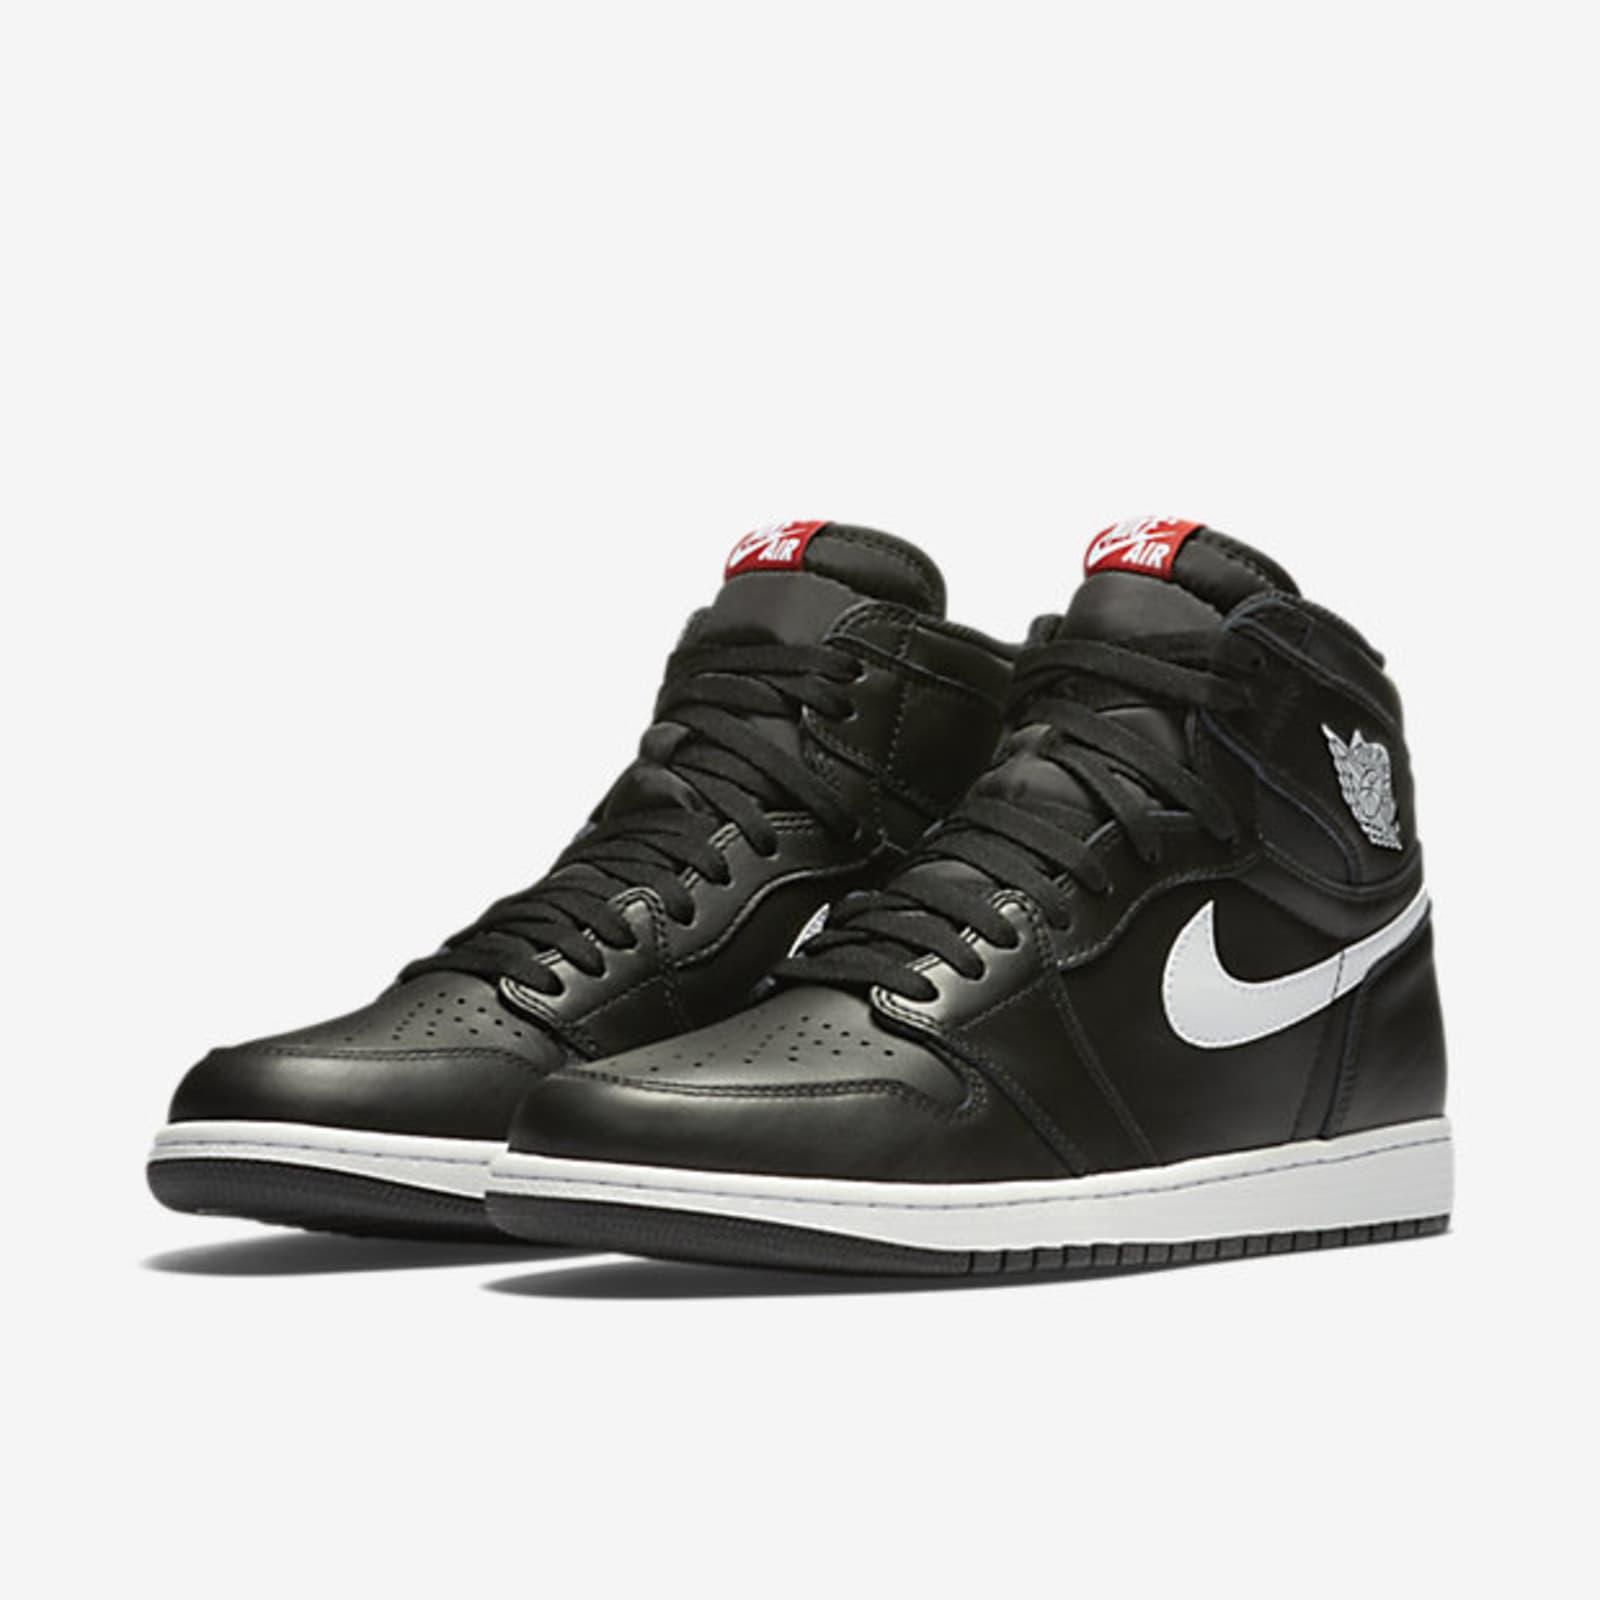 38eaf9e0a50 Air Jordan 1 Retro High Decon - Air Jordan 25 Percent Off Sale Nike ...